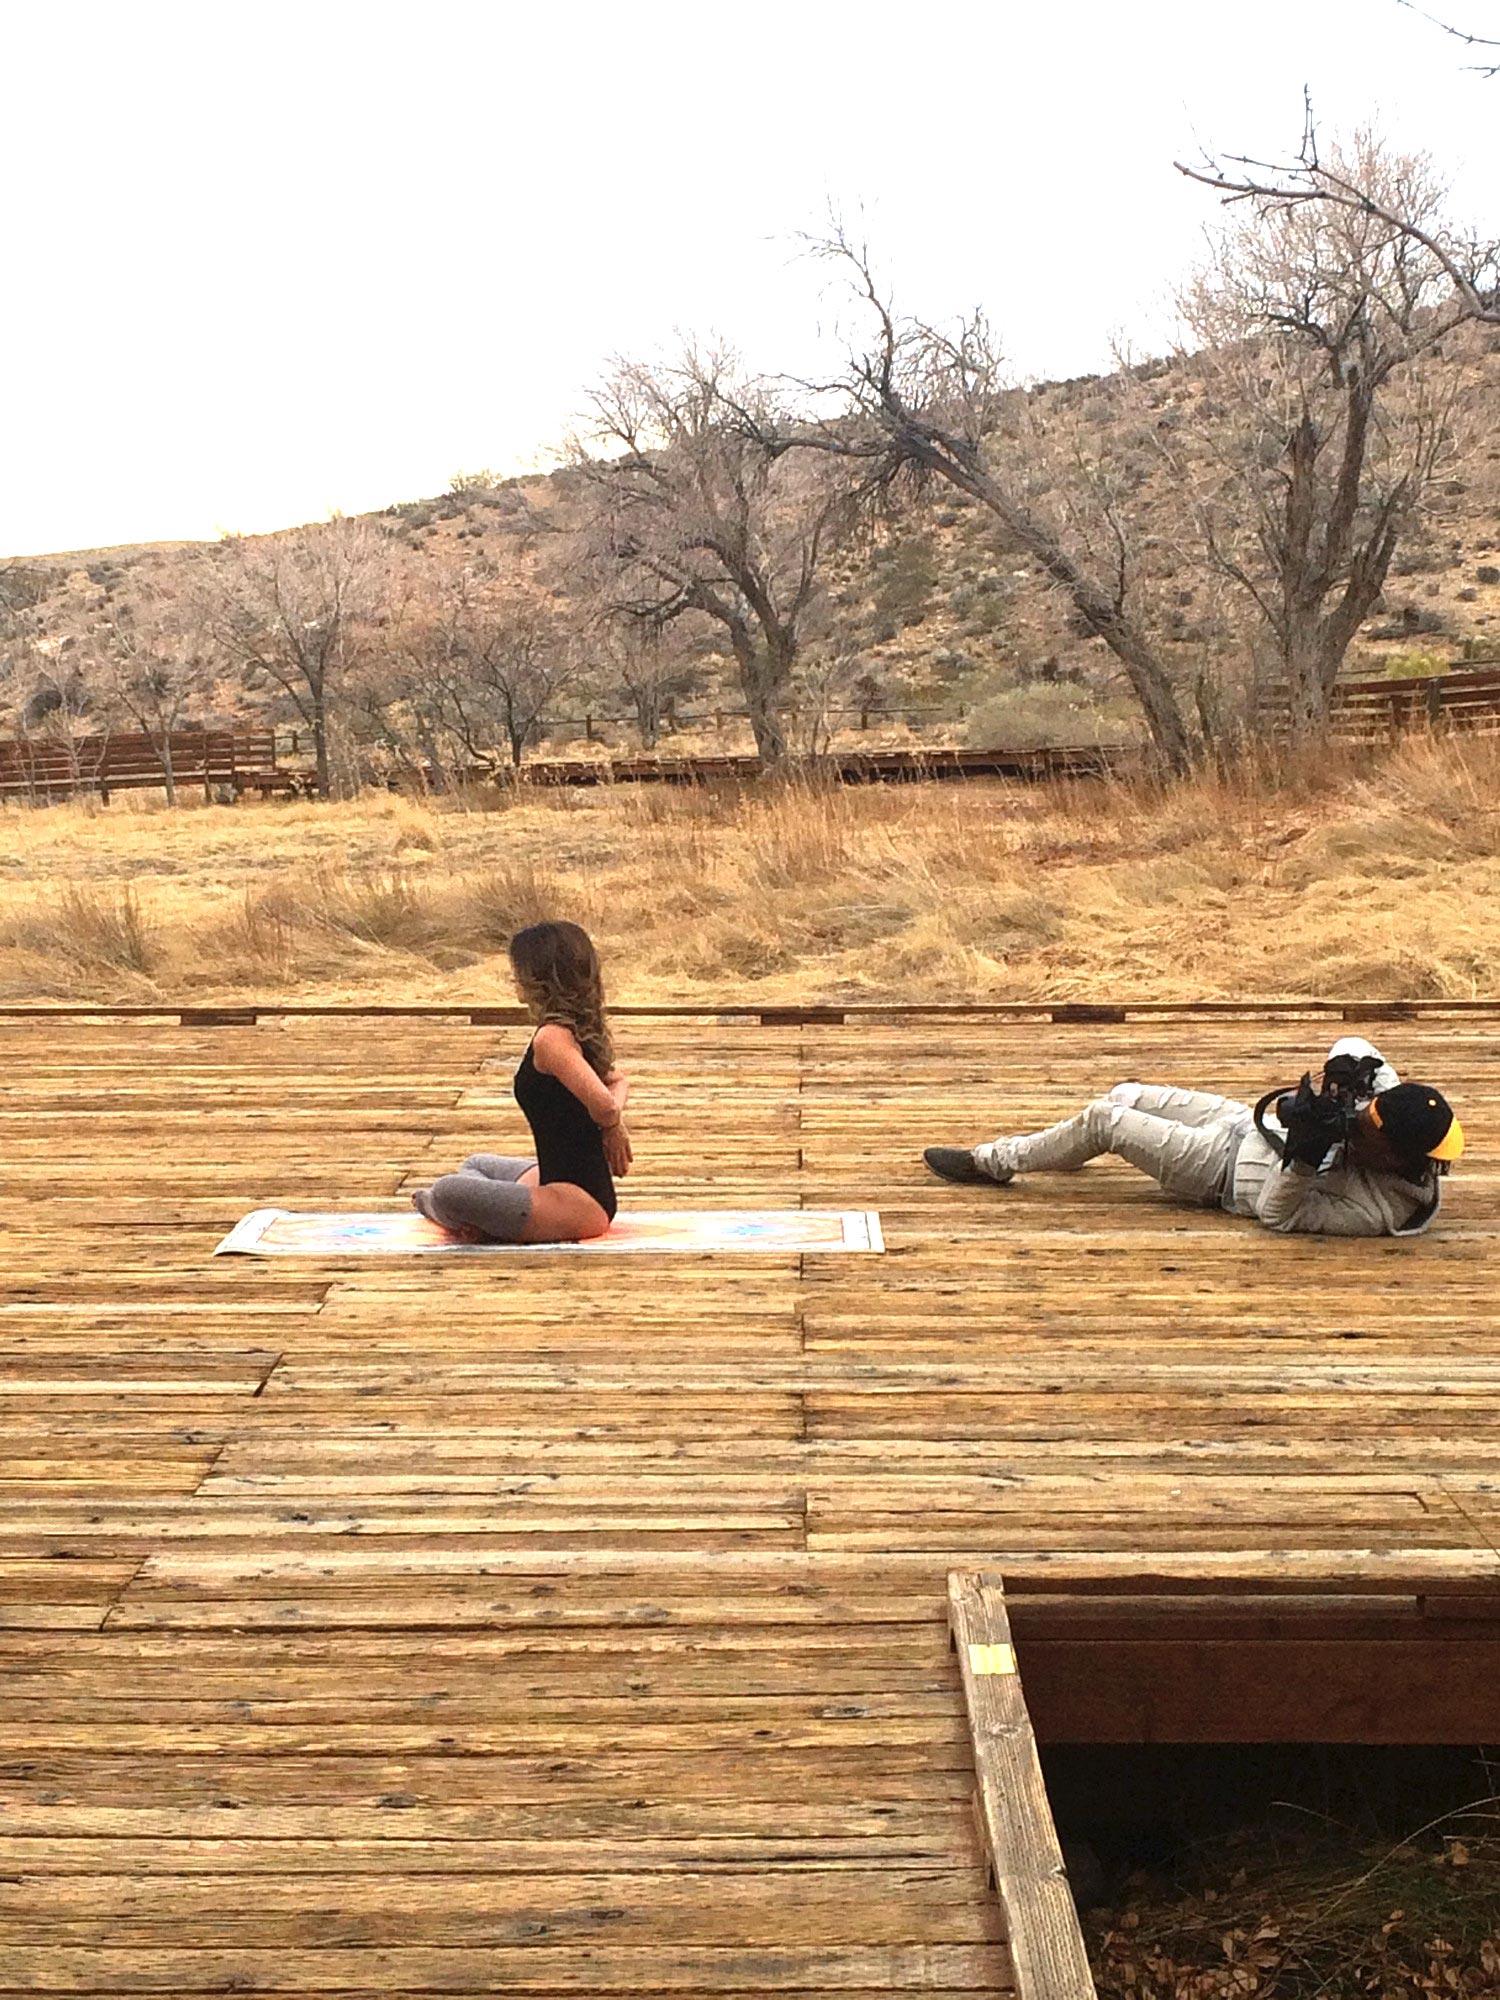 yoga mat c/o  One By Sun . Desert shoot shot by  Charles Henry .